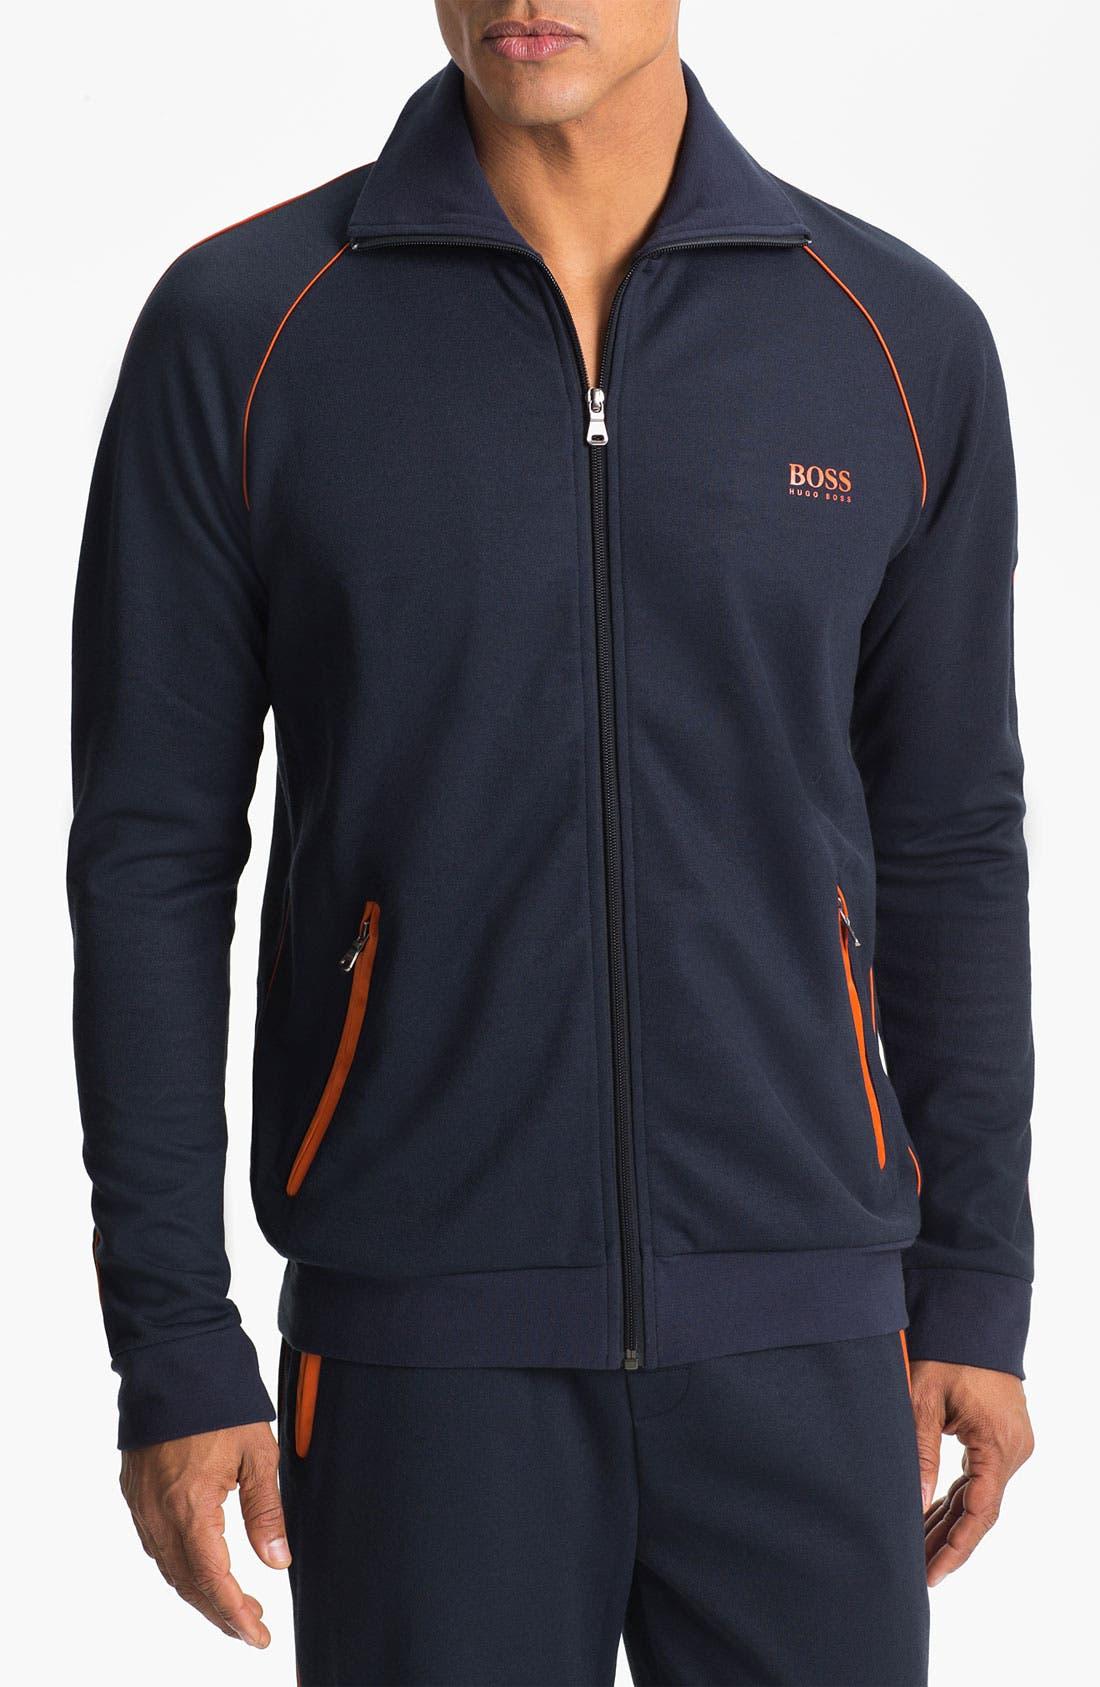 Main Image - BOSS Black 'Innovation 5' Jacket